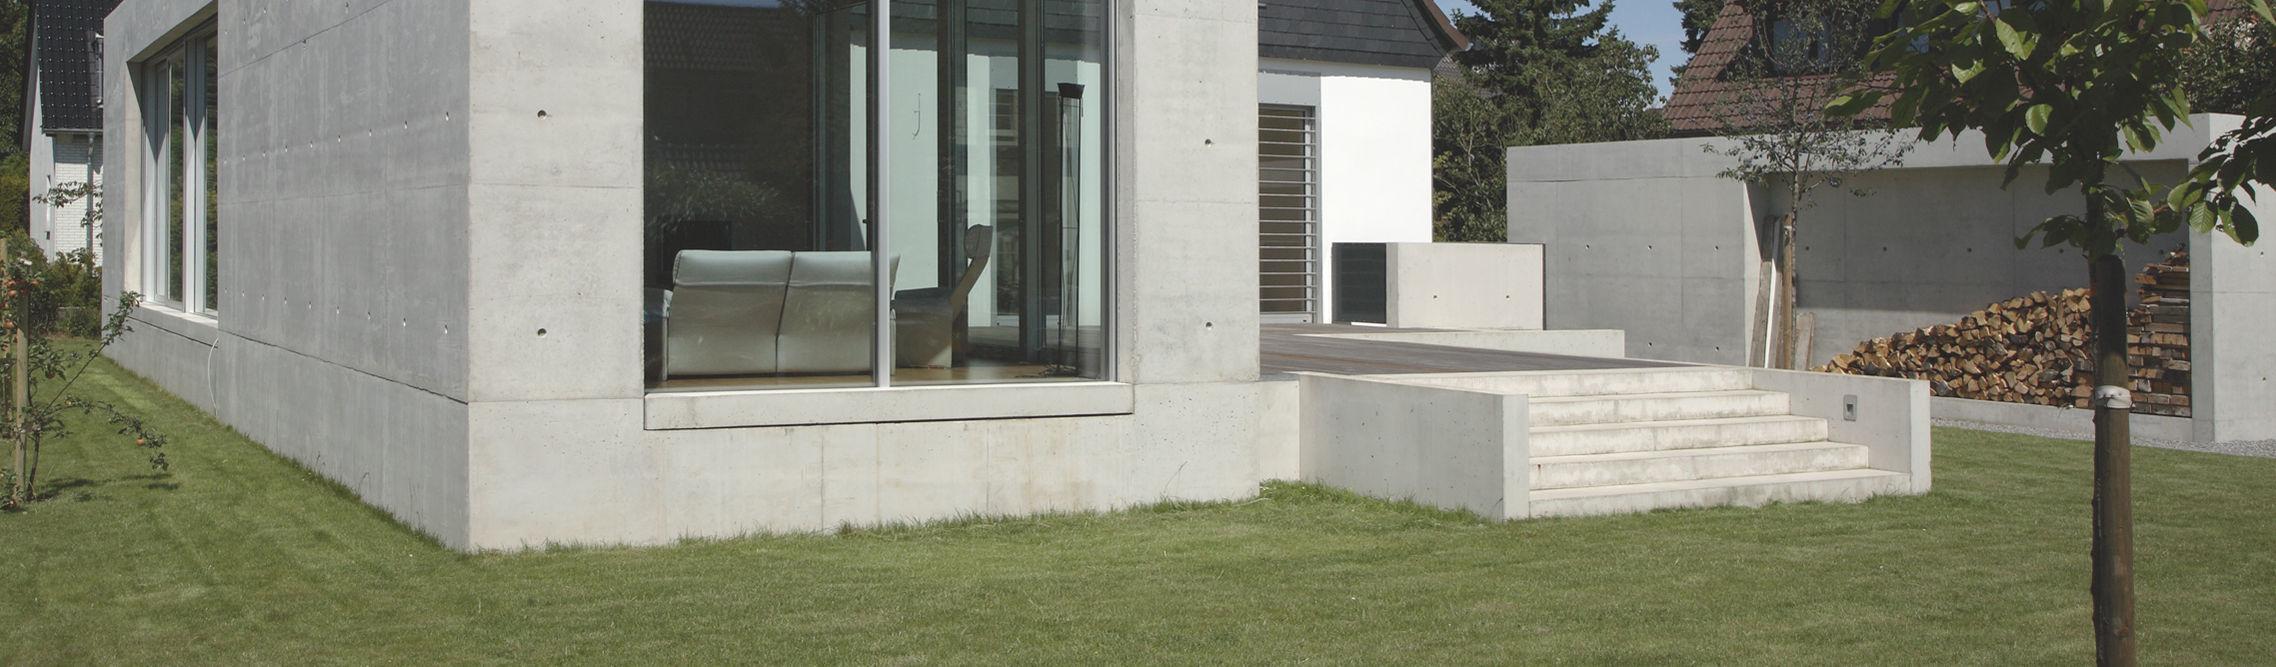 oliver keuper architekt bda architekten in essen homify. Black Bedroom Furniture Sets. Home Design Ideas